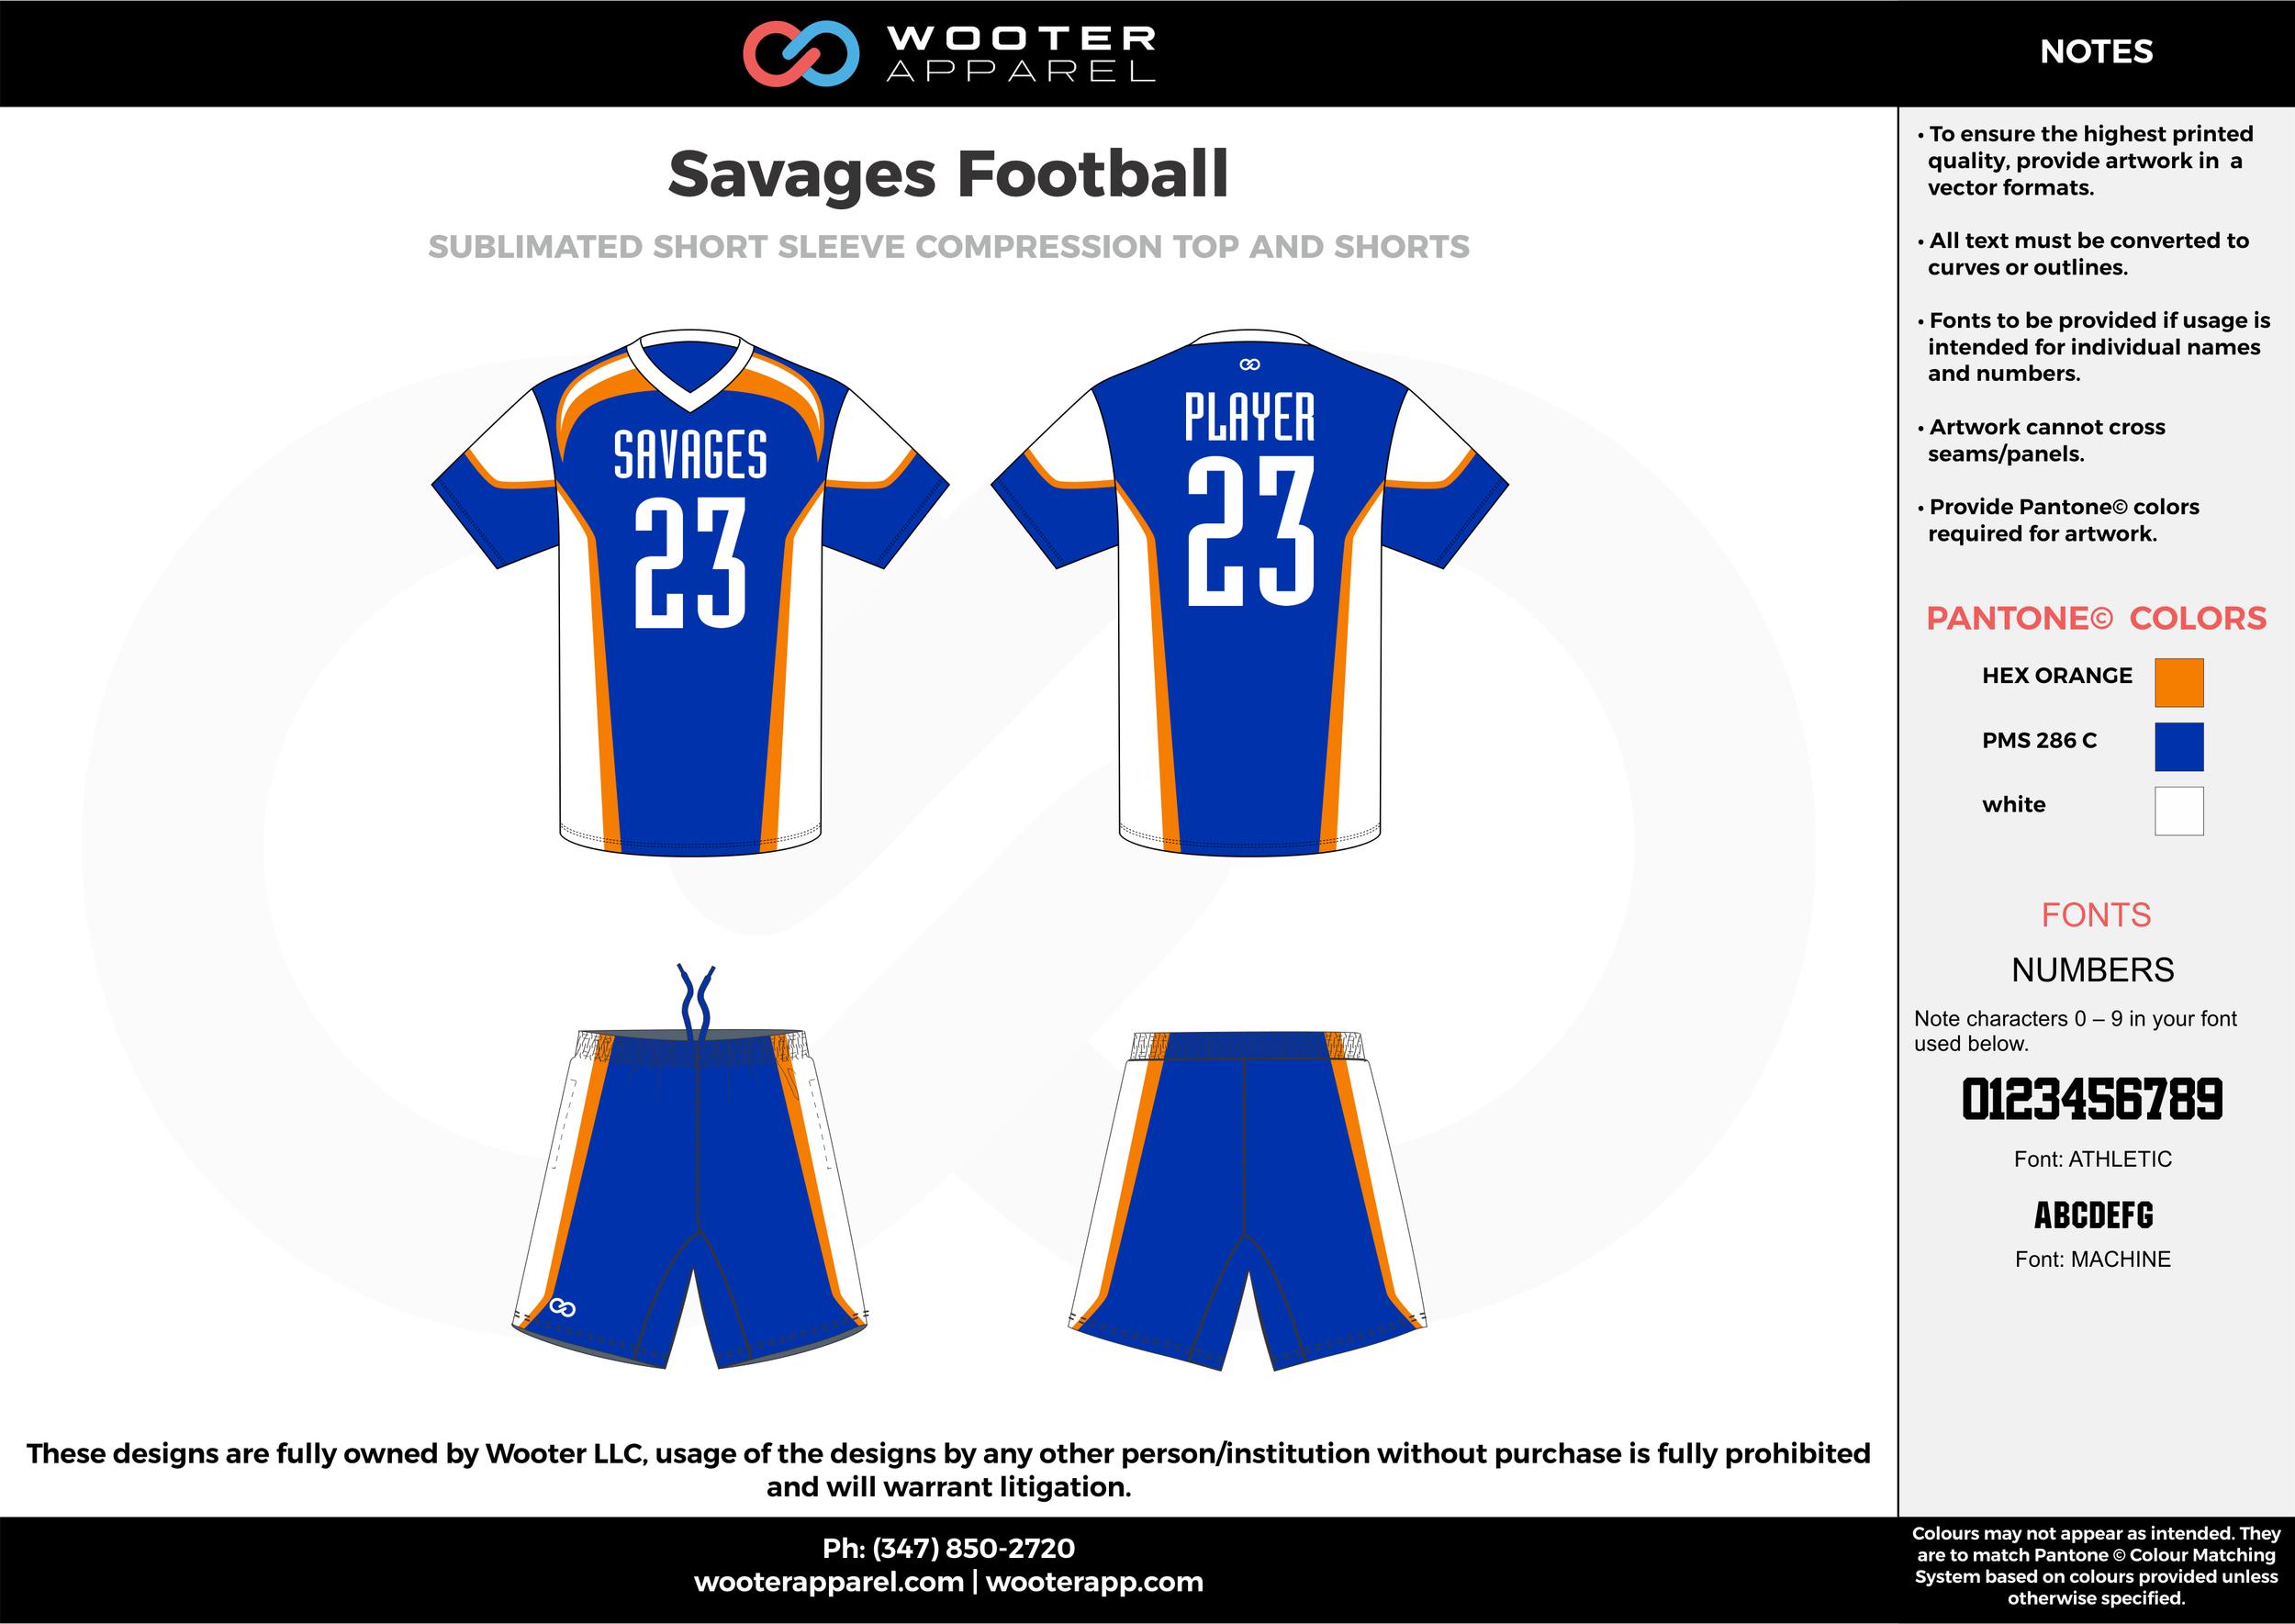 Savages Football blue white orange football uniforms jerseys shorts